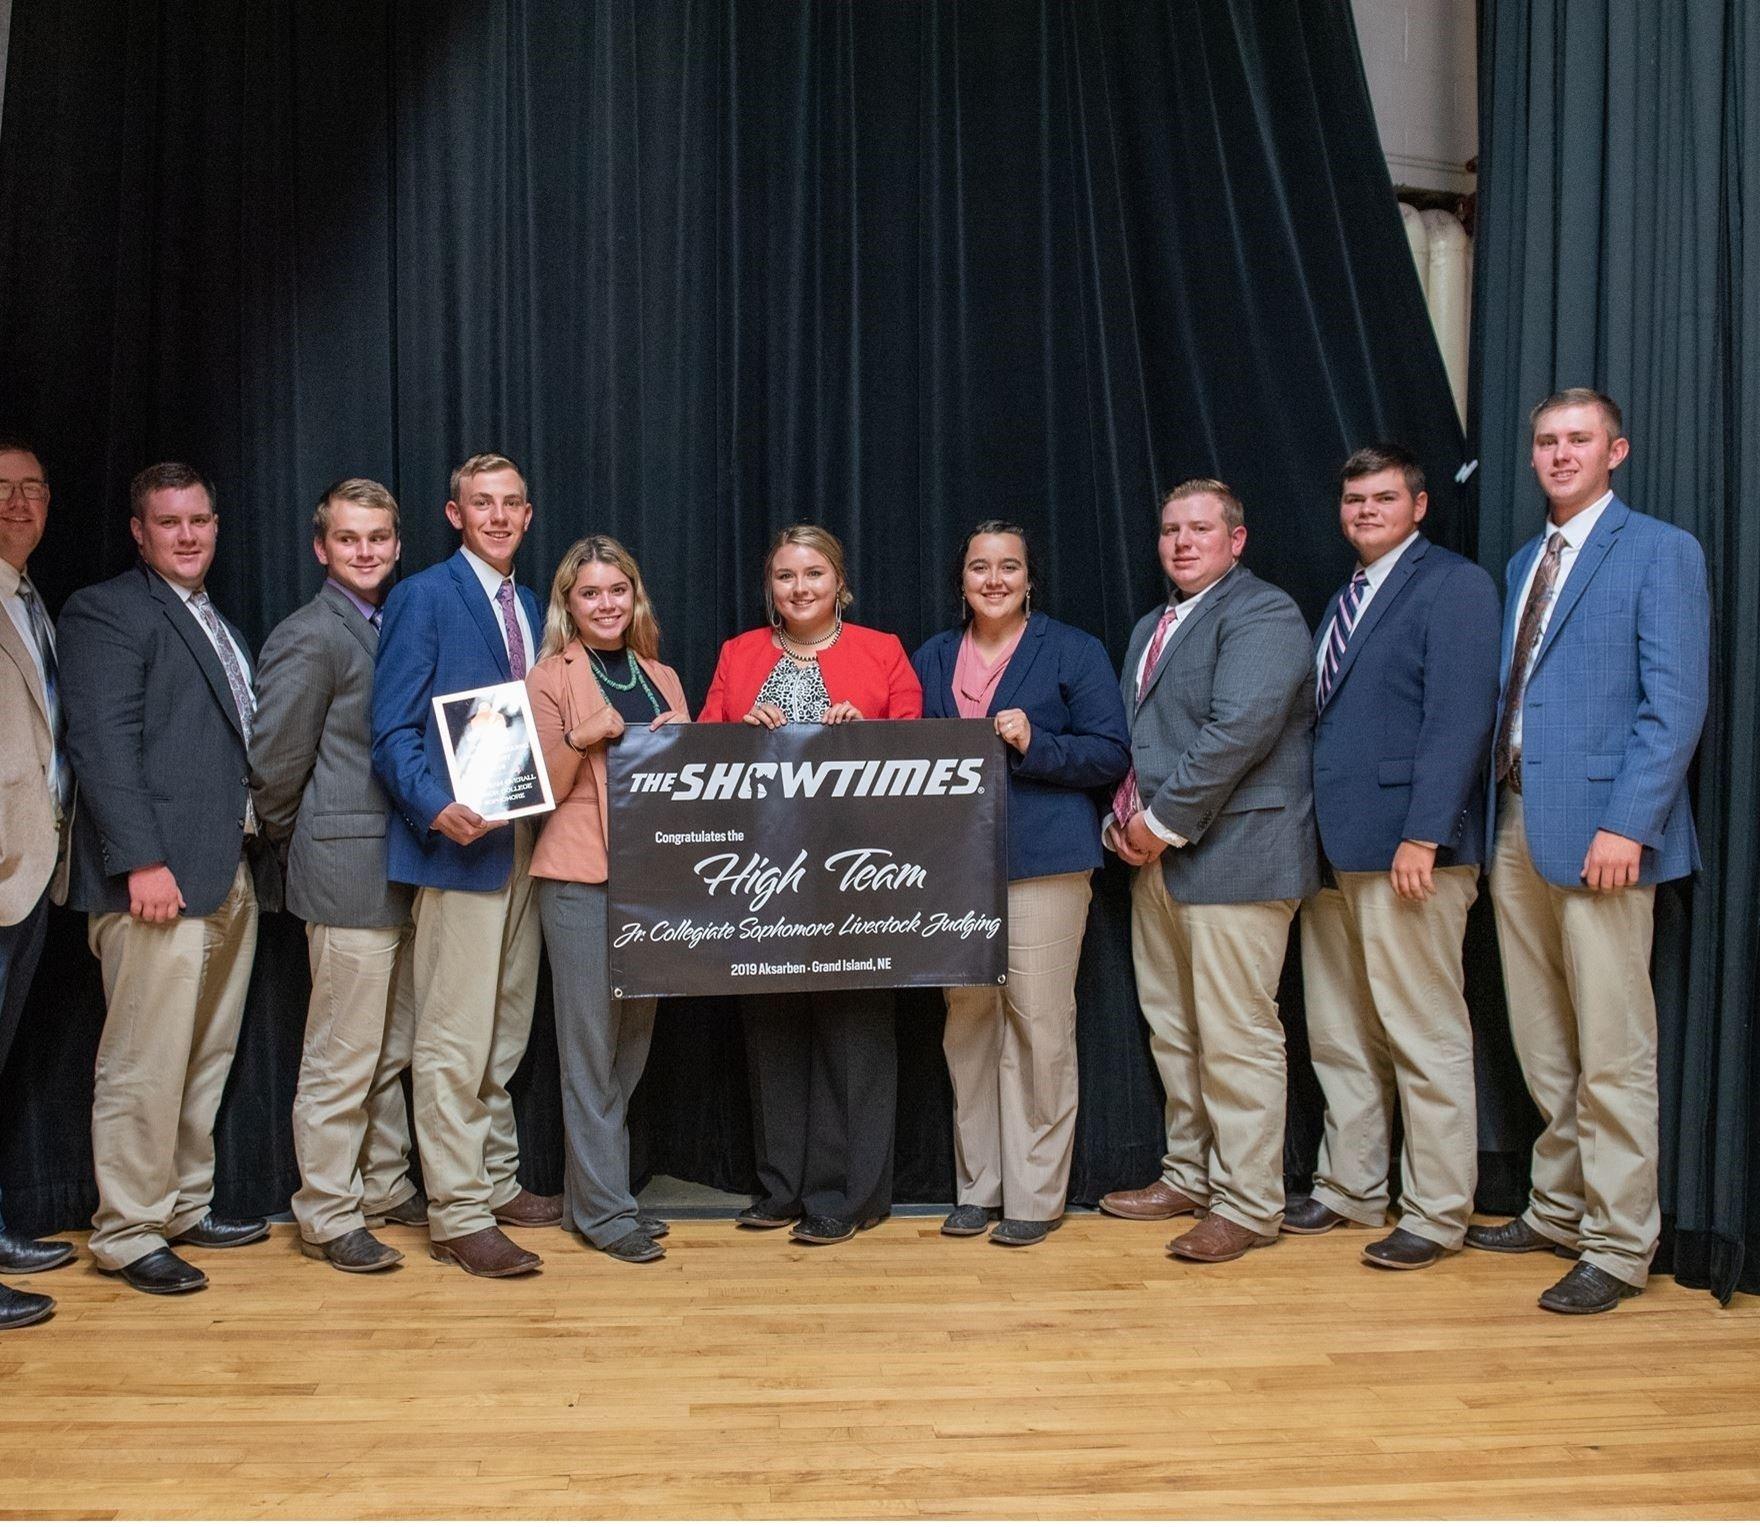 2018 High Team Jr. Collegiate Sophomore Livestock Judging